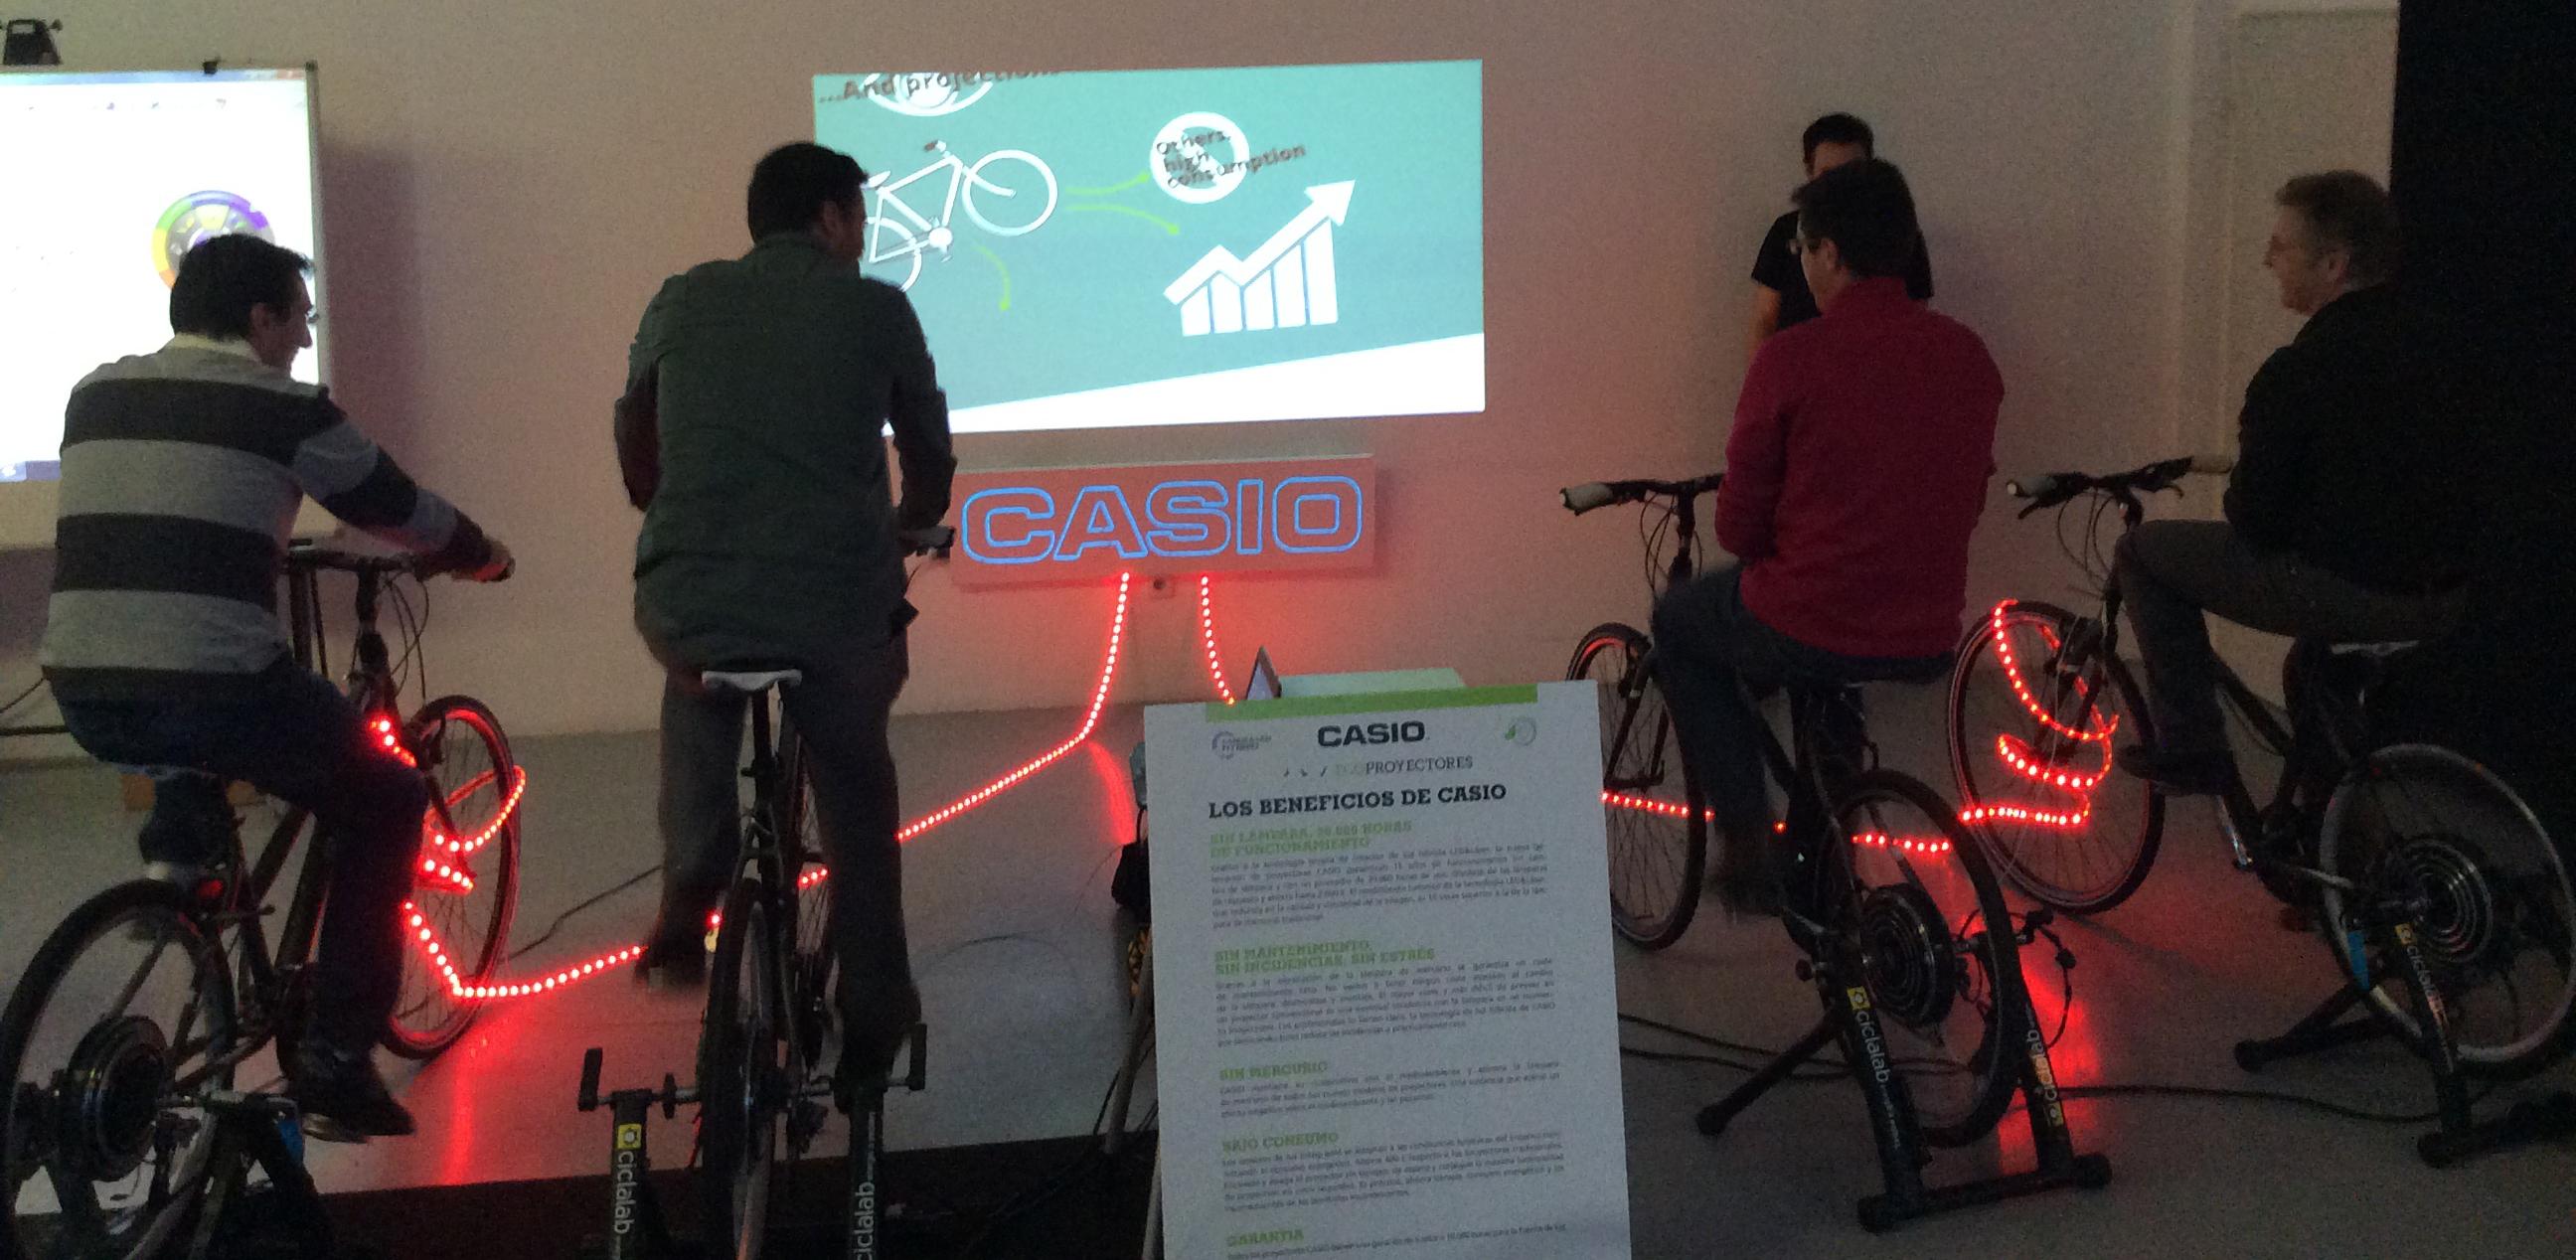 Casio - Ecoproyectores